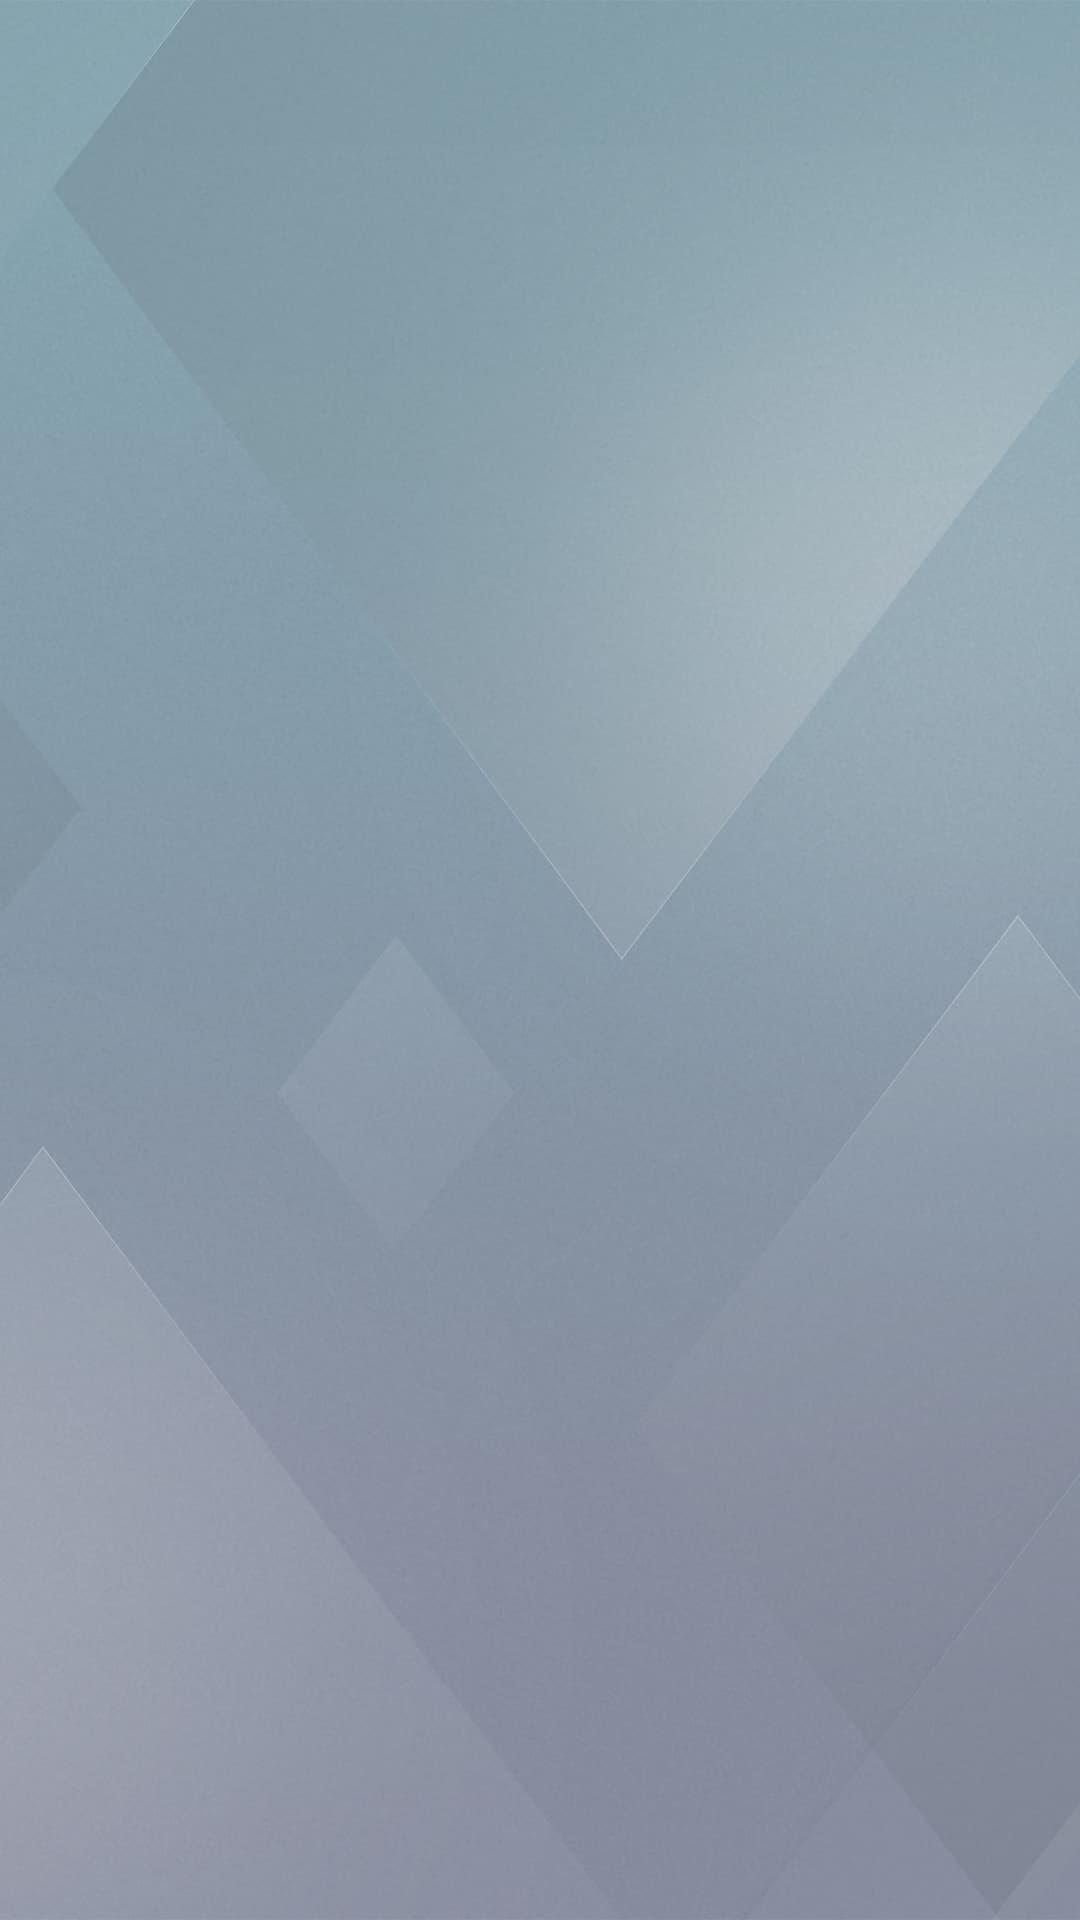 Meizu MX5 wallpaper 13